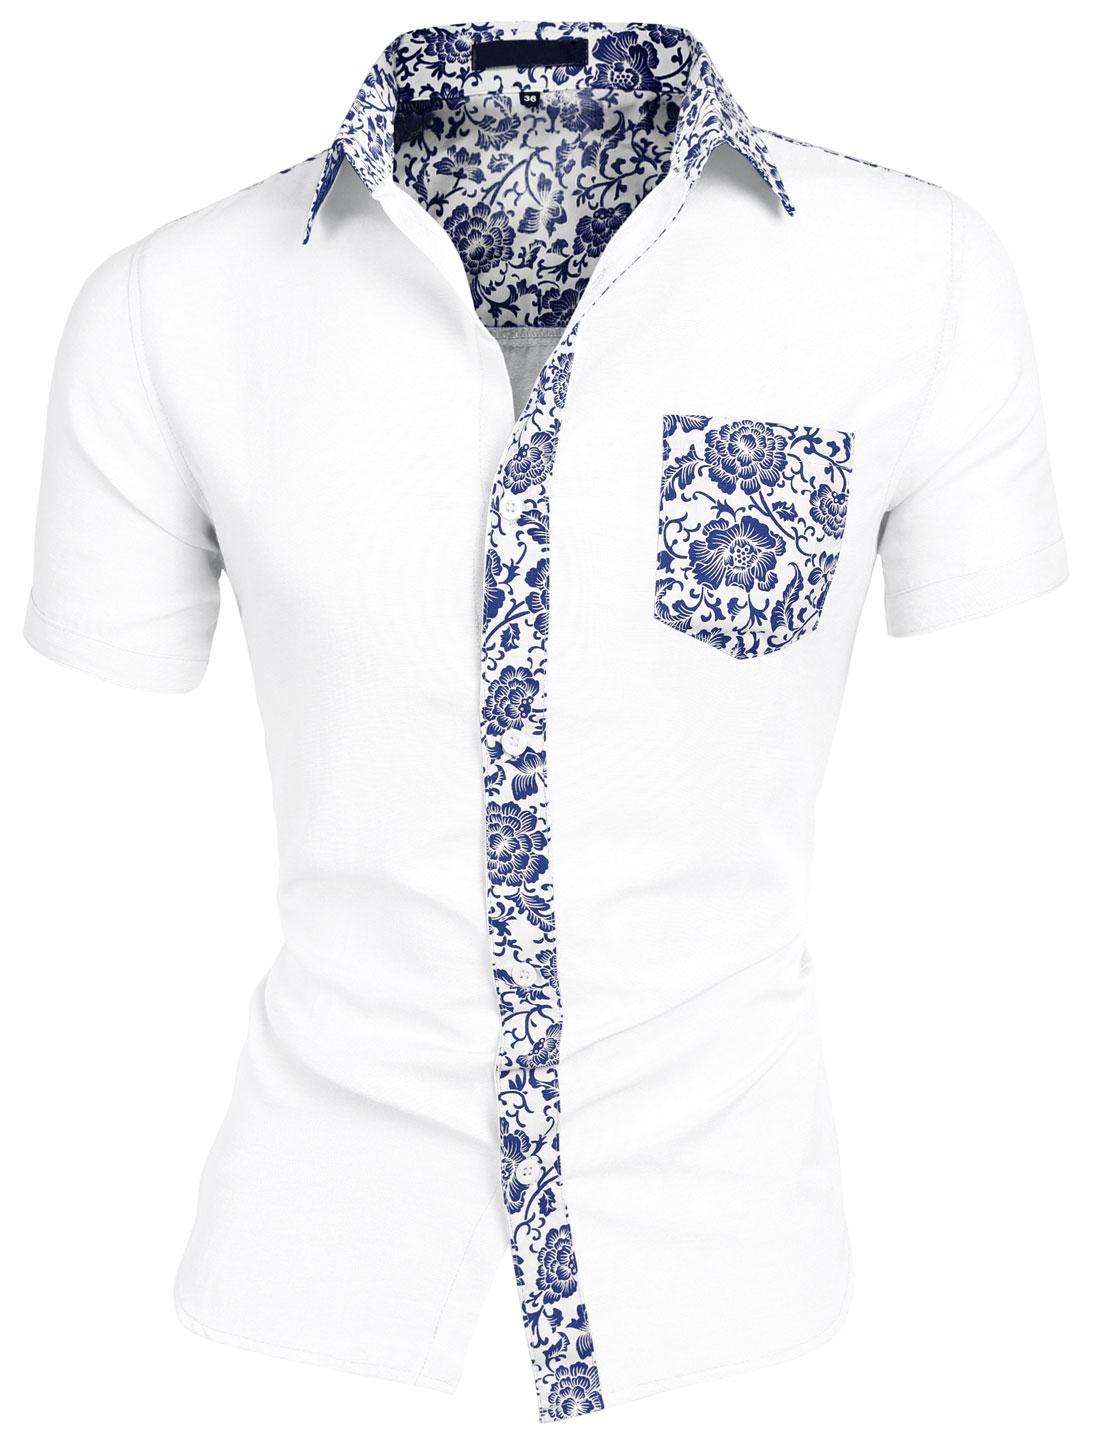 Men Summer Floral Pocket Short Sleeve Button Down Hawaiian Shirt Navy White S